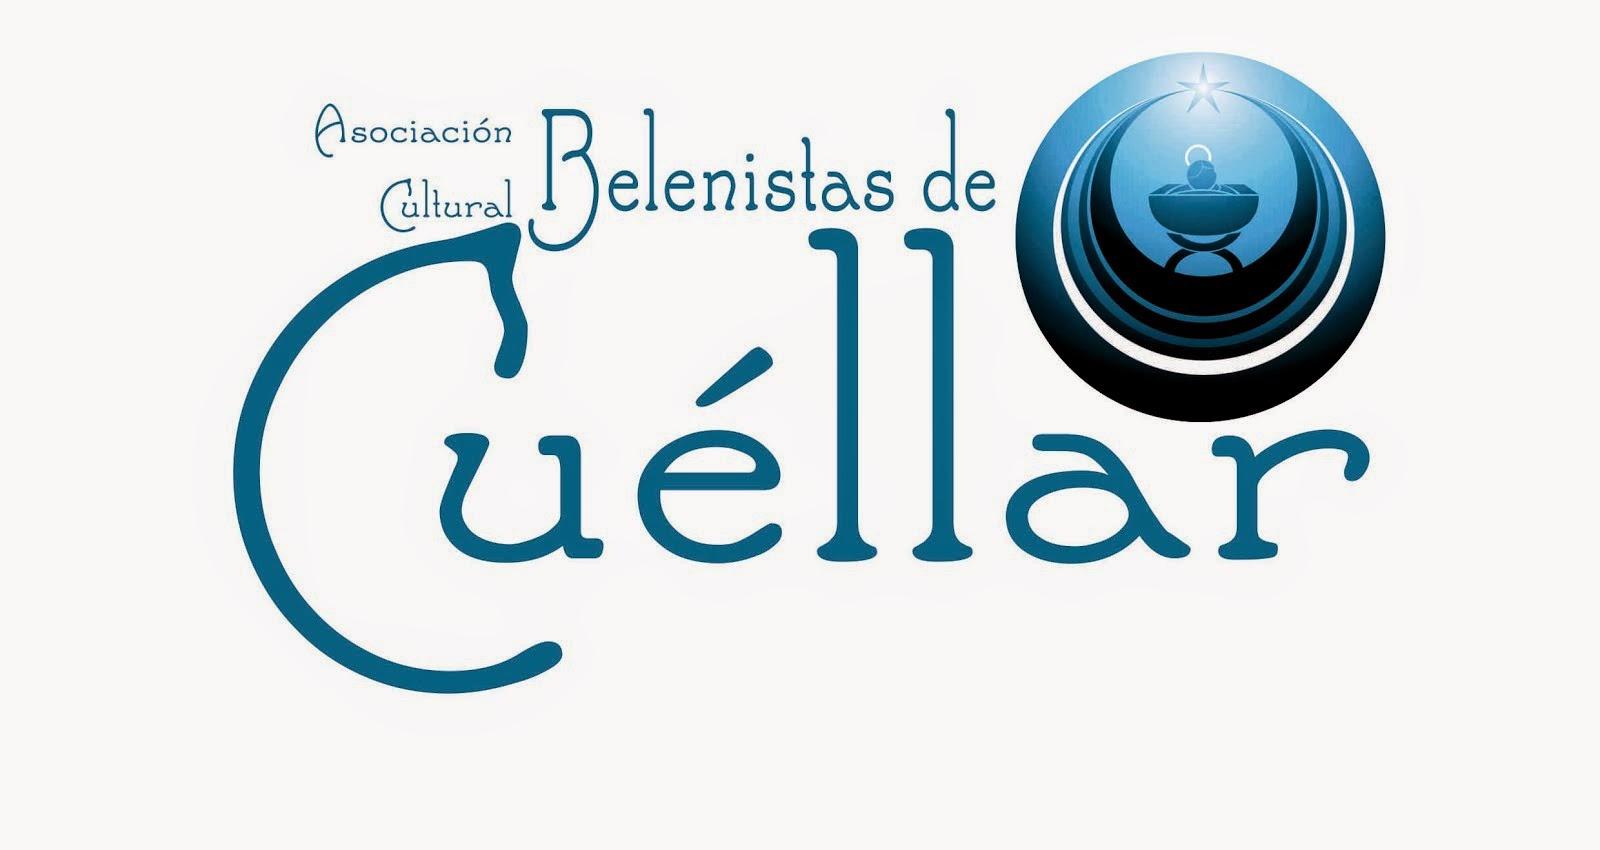 BELENISTAS DE CUELLAR